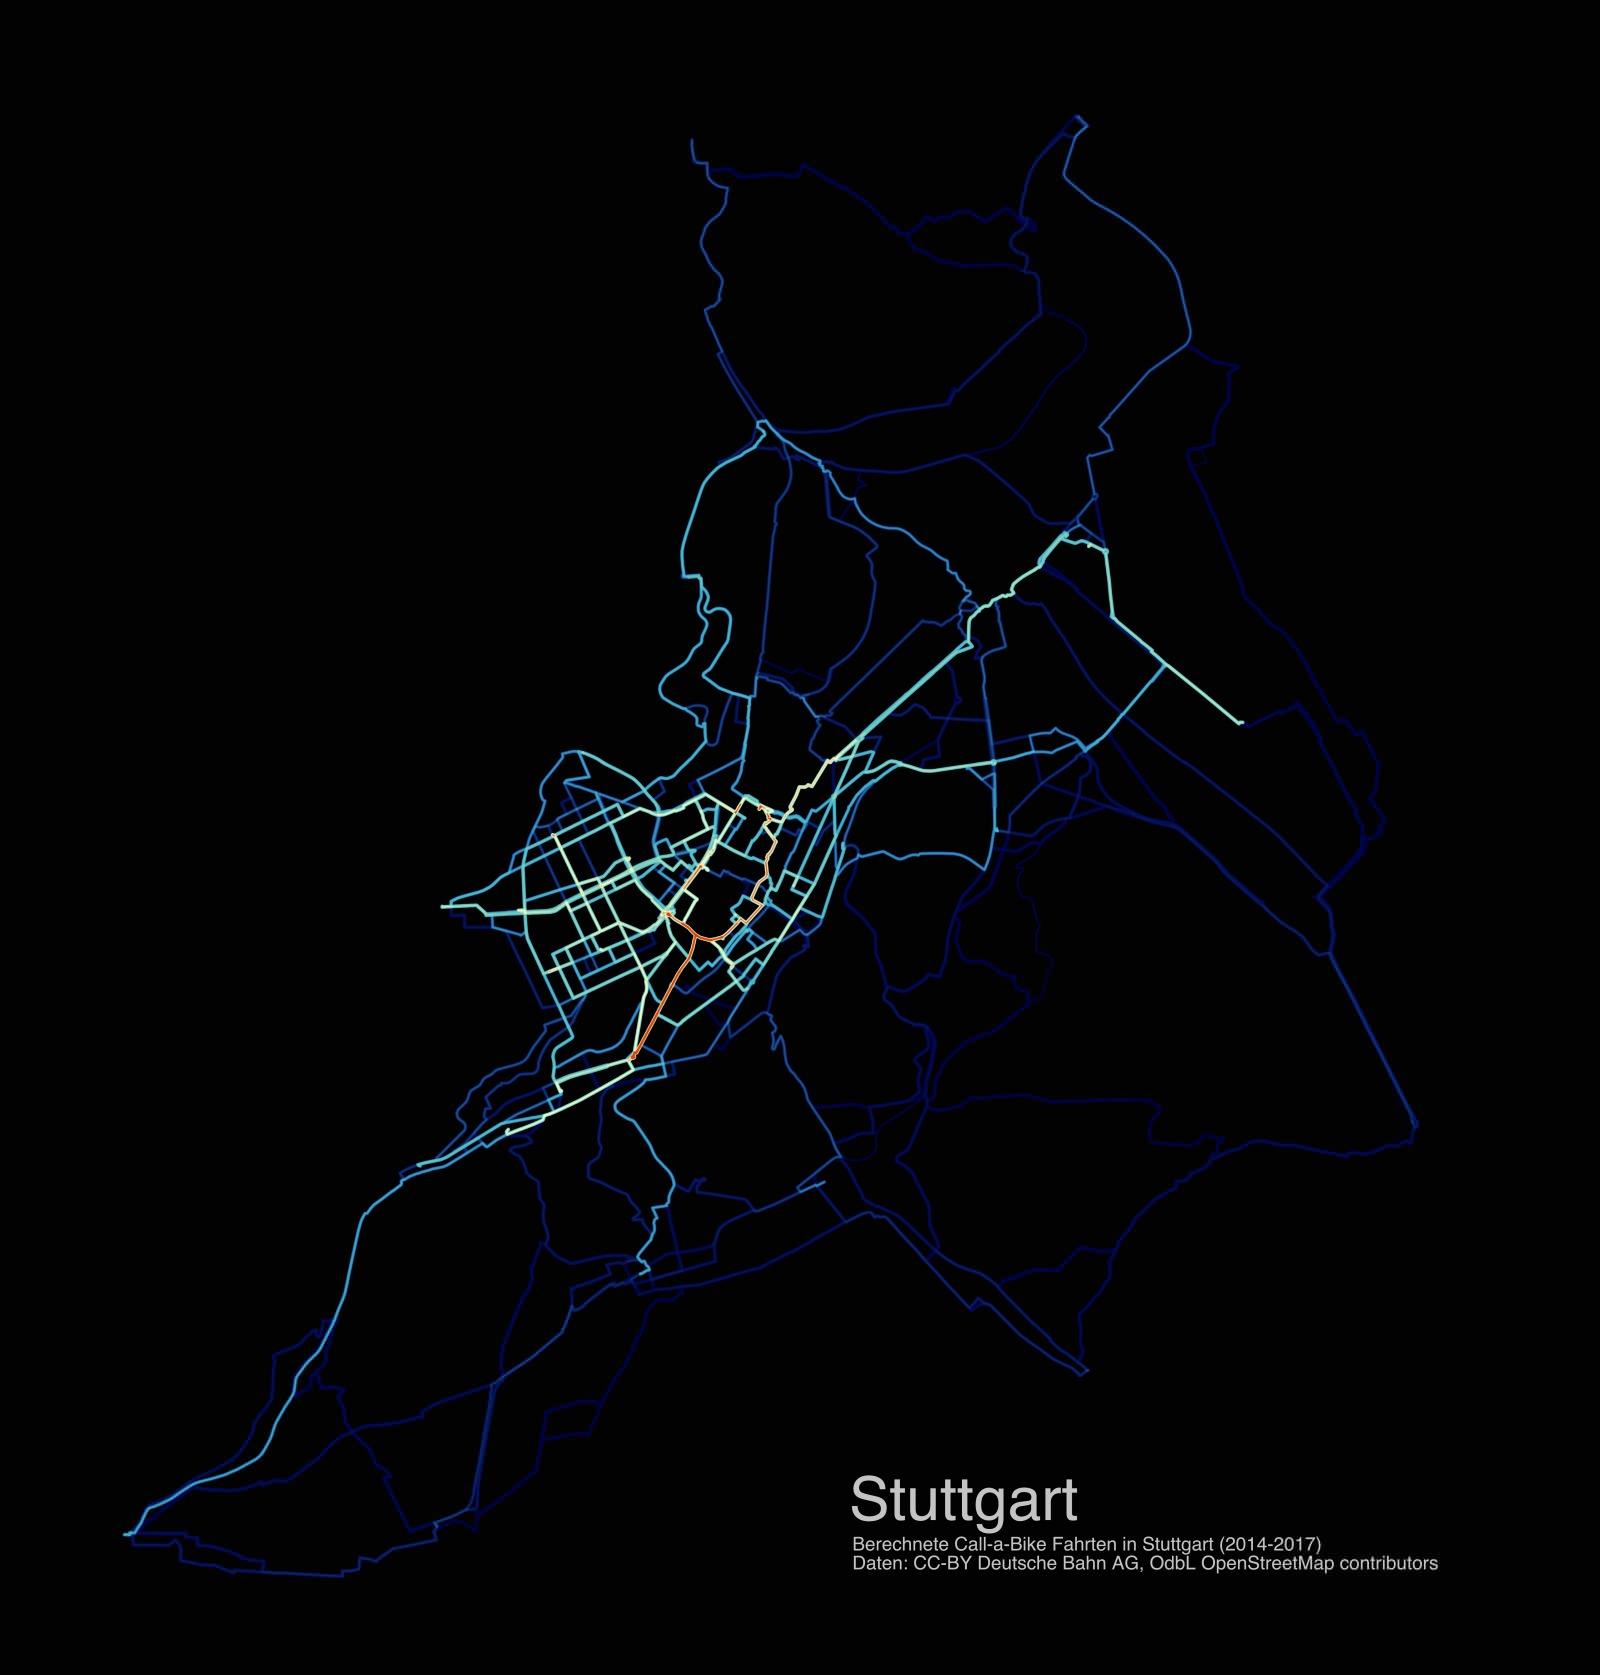 Stuttgart Radverkehr Routen Bikesharing Call a Bike 2014 2015 2016 2017